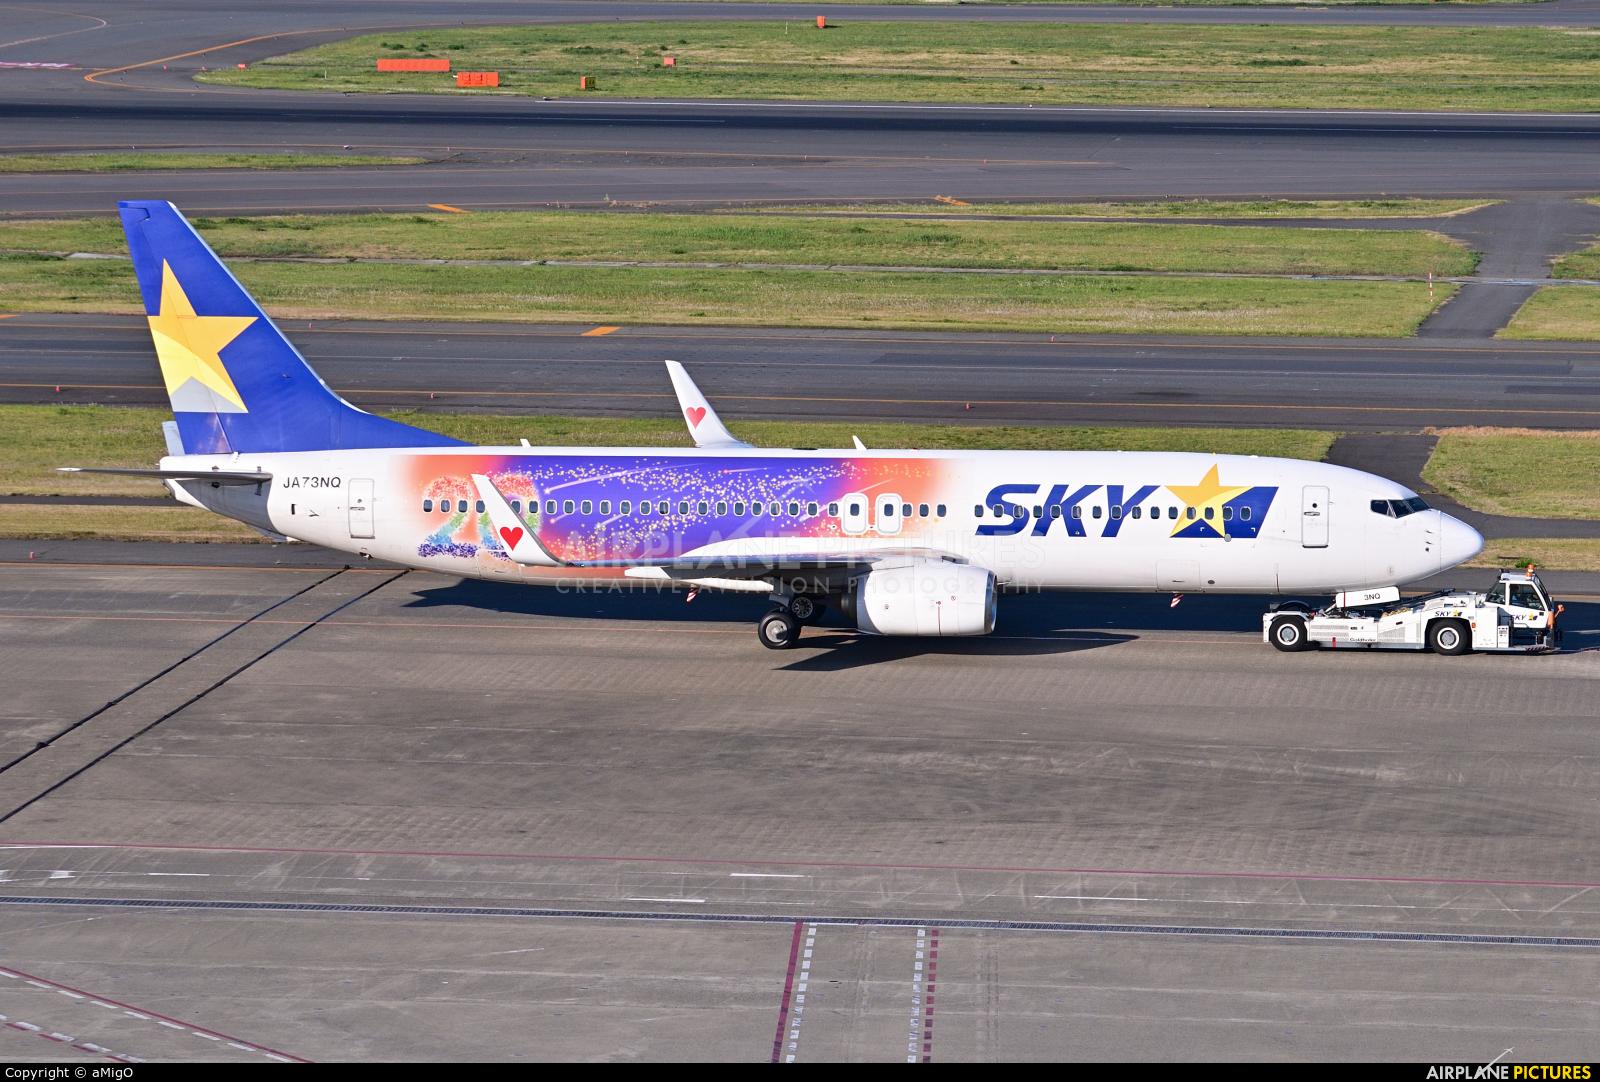 Skymark Airlines JA73NQ aircraft at Tokyo - Haneda Intl